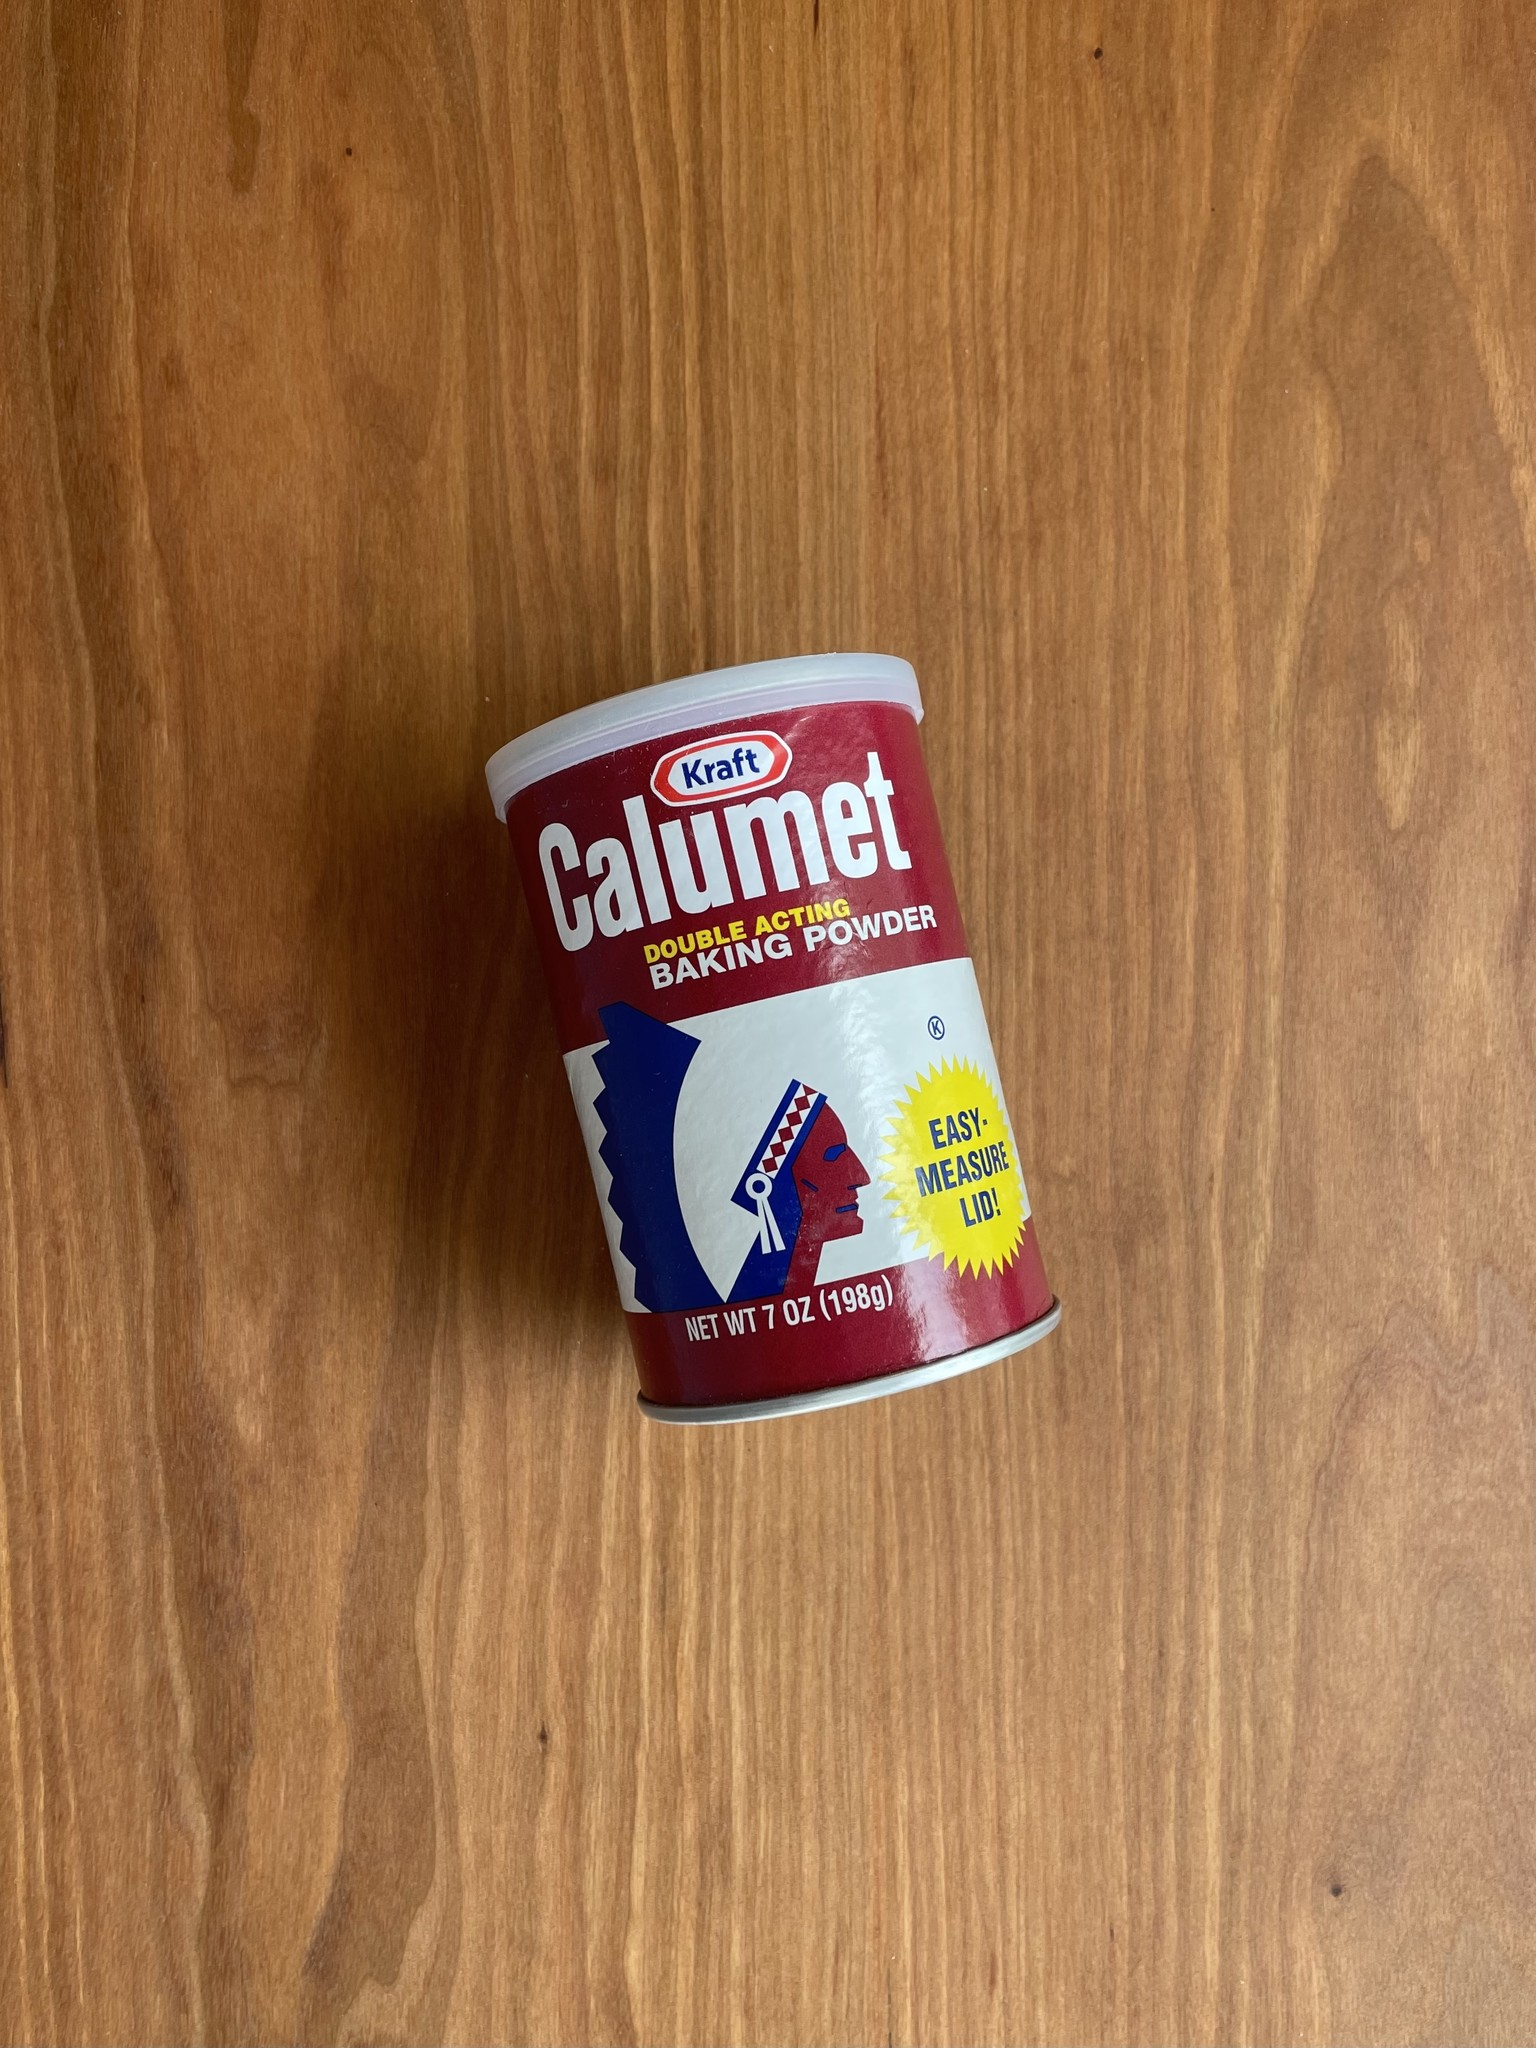 Kraft Calumet Baking Powder-1